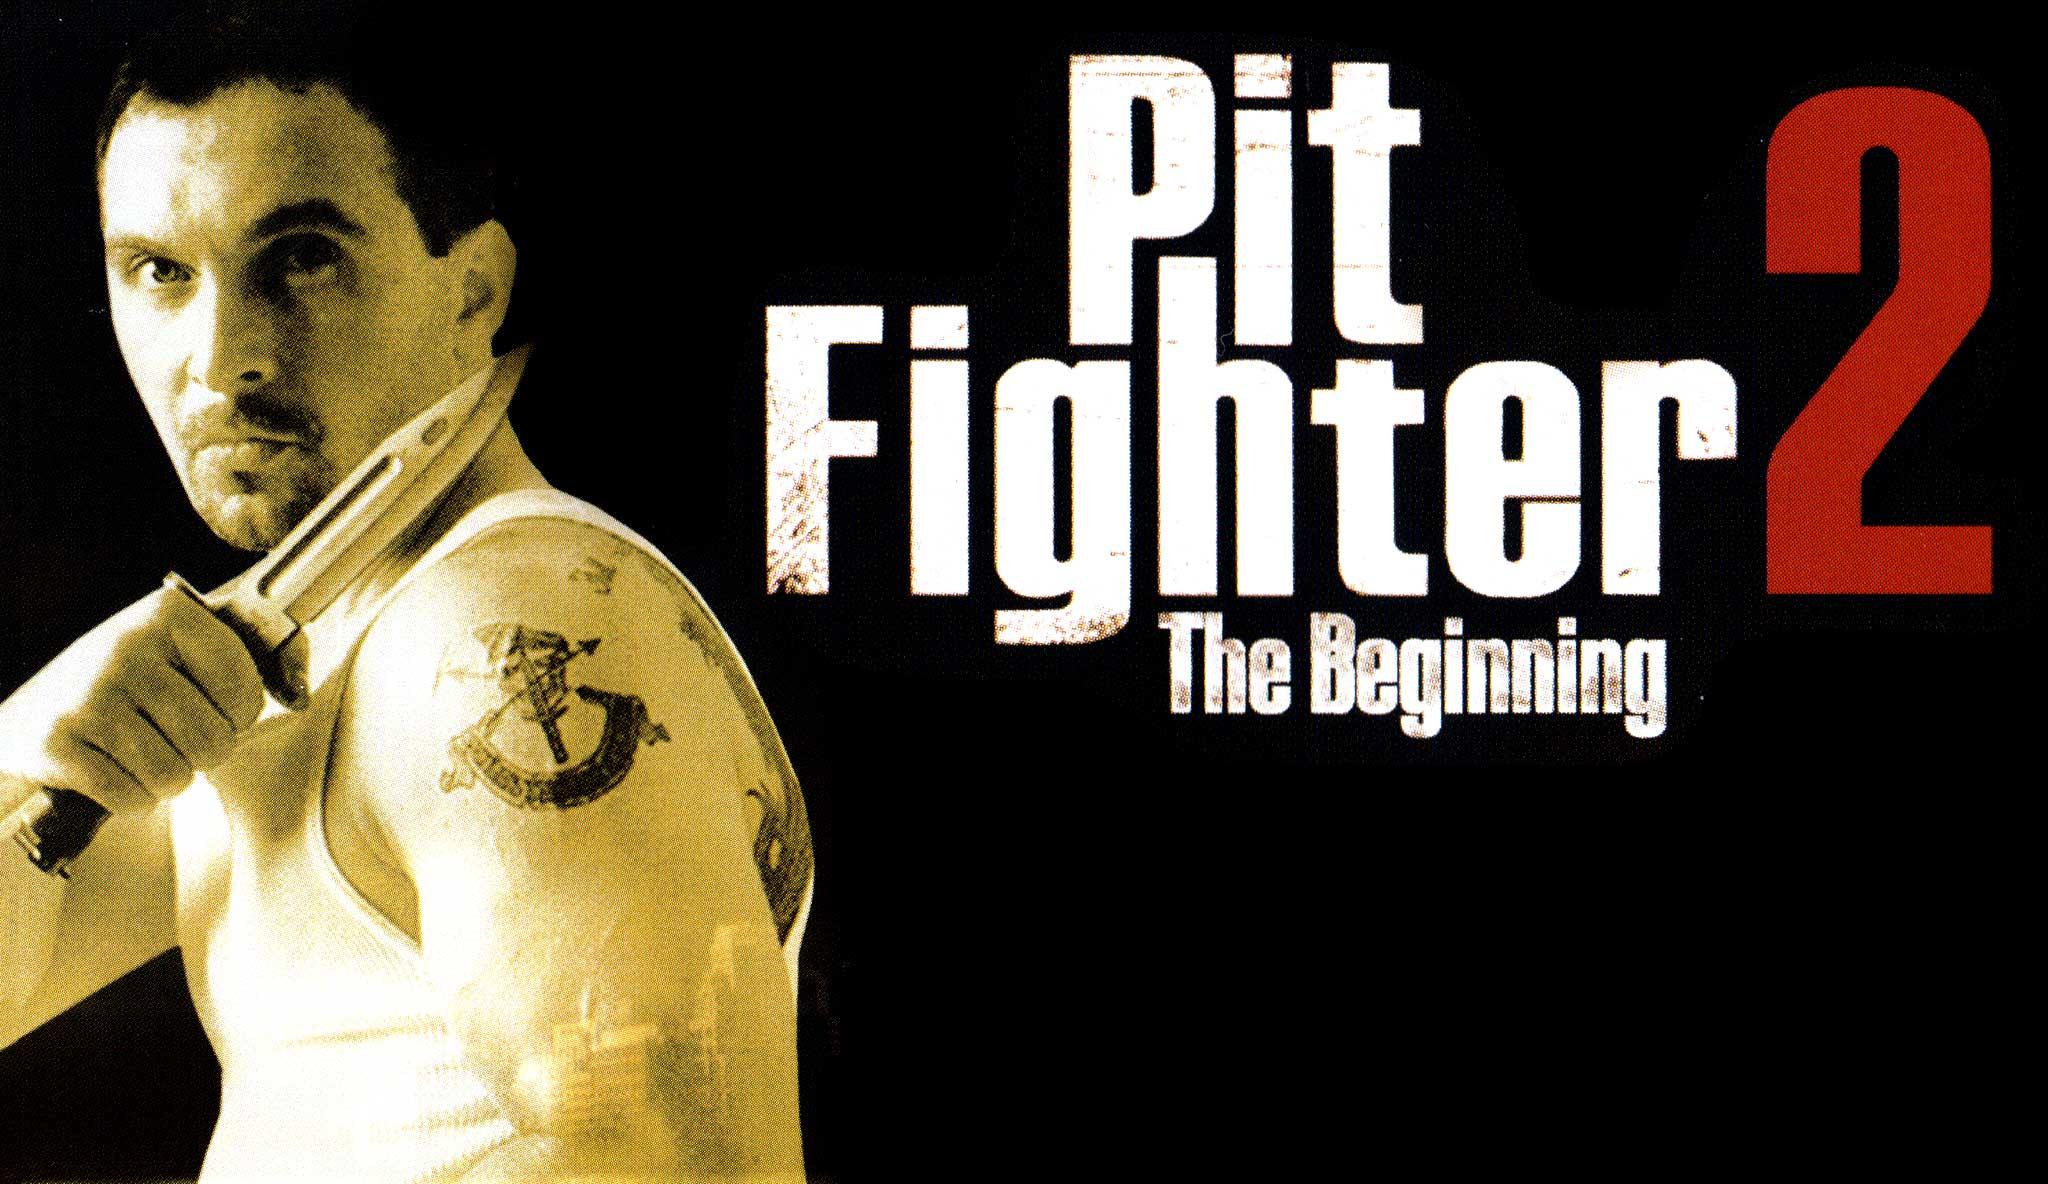 pit-fighter-2-the-beginning\header.jpg